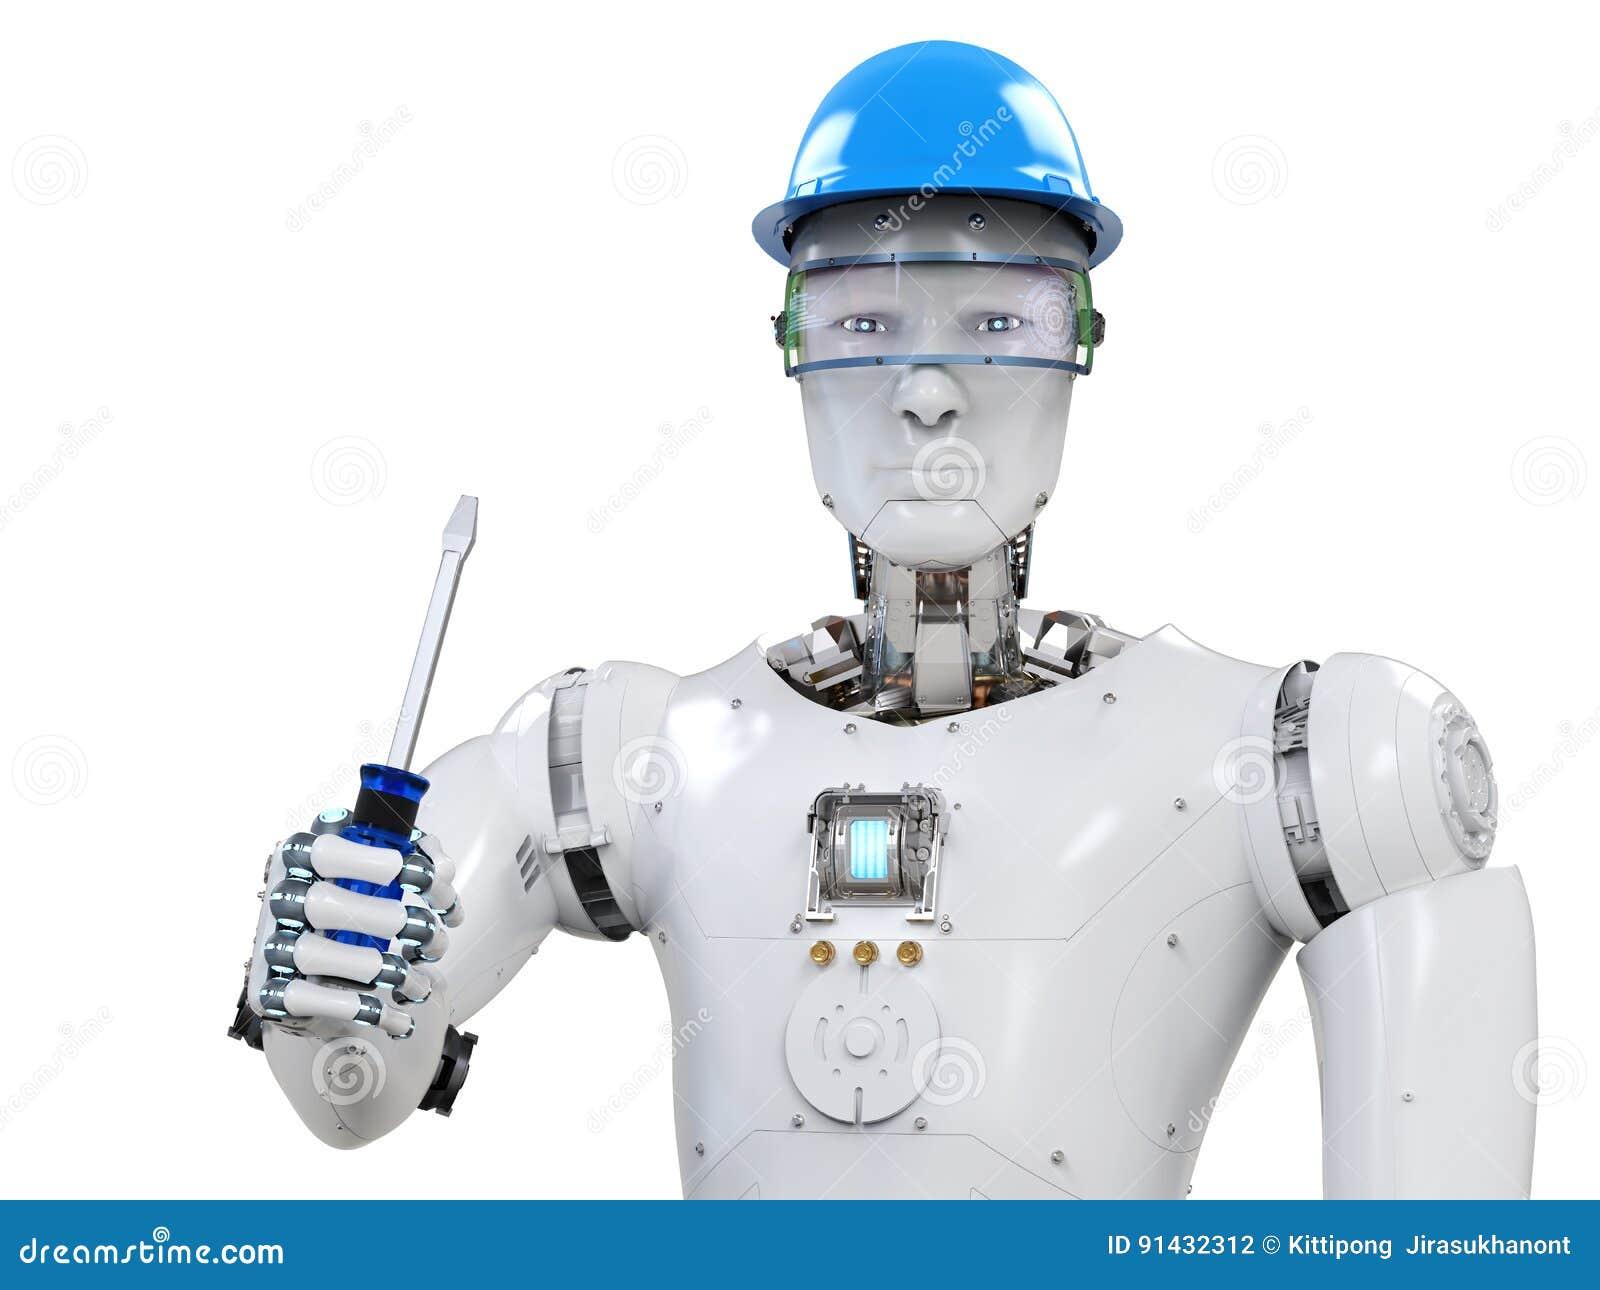 Engineer robot wearing safety helmet